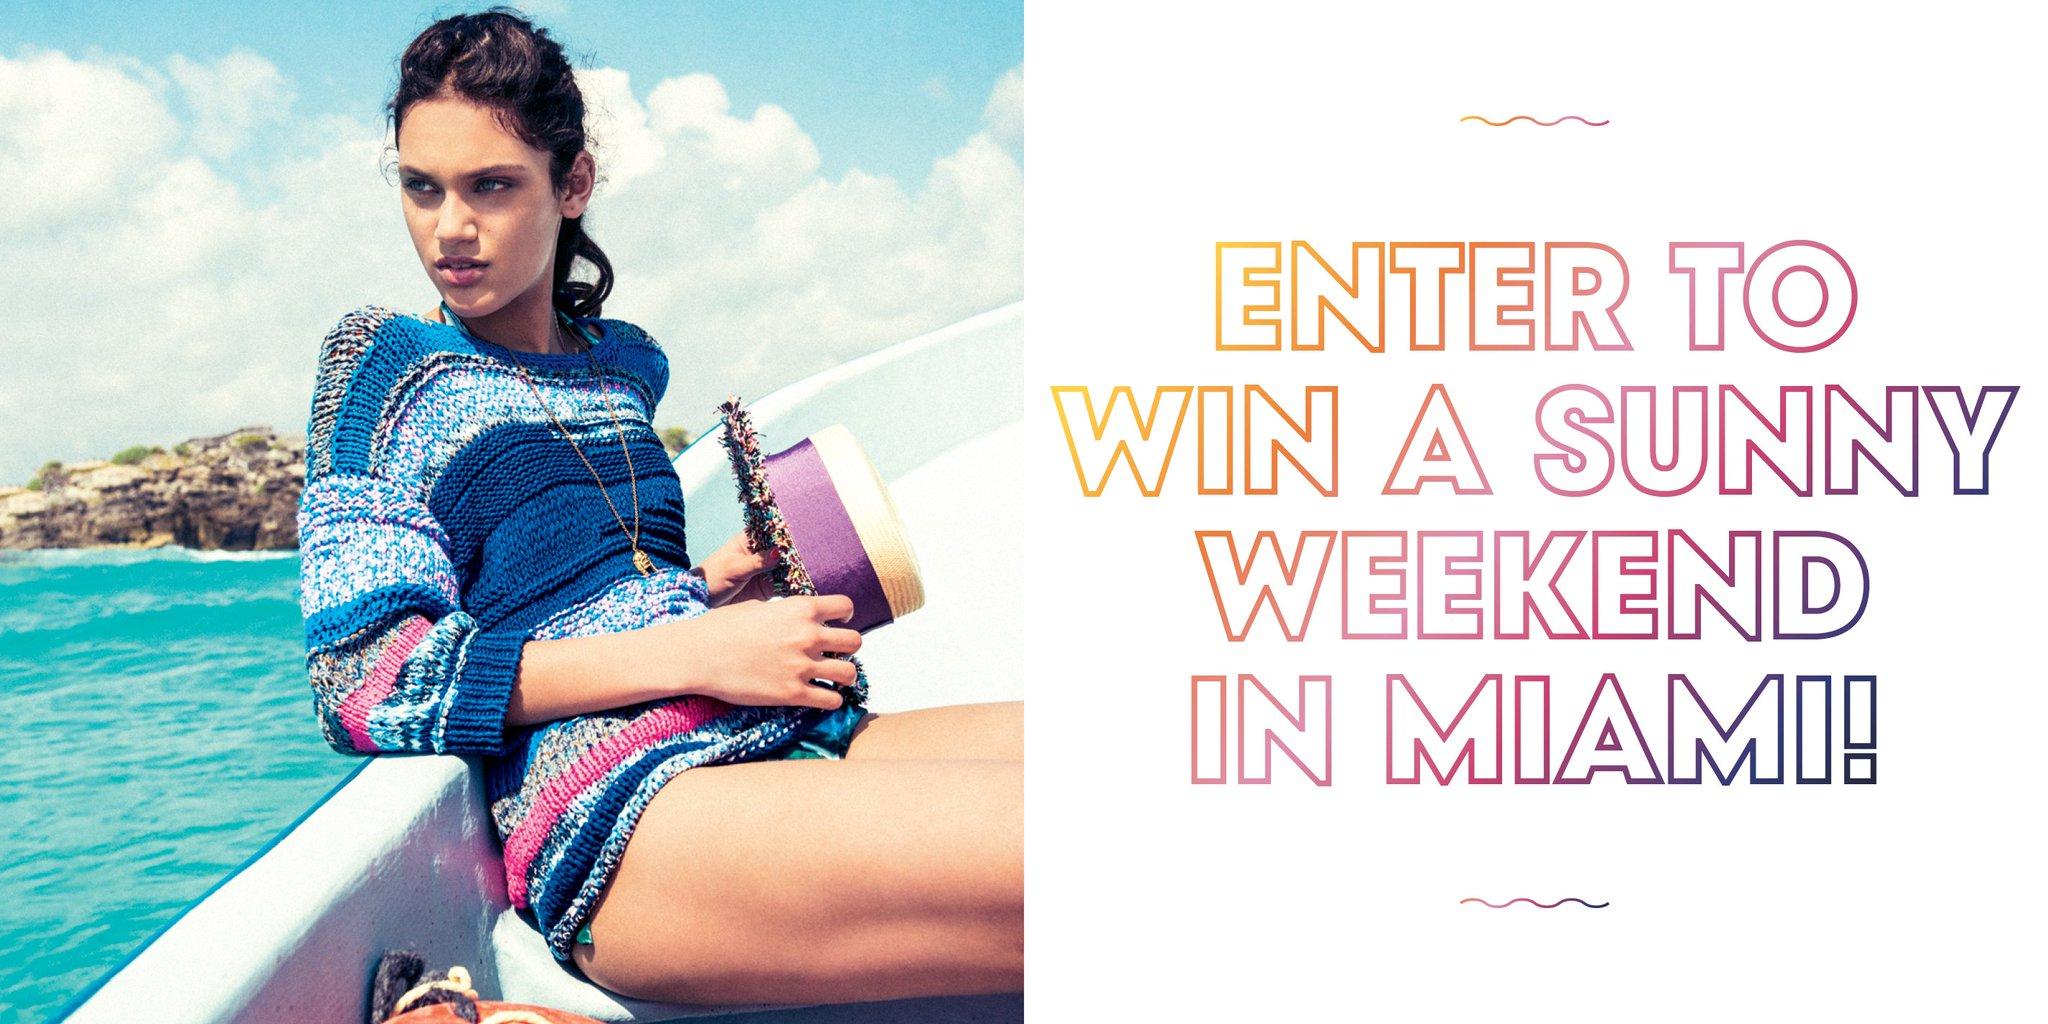 Win a free trip to Miami! https://t.co/GgYCQ52CMy https://t.co/xPO6JPdxQE